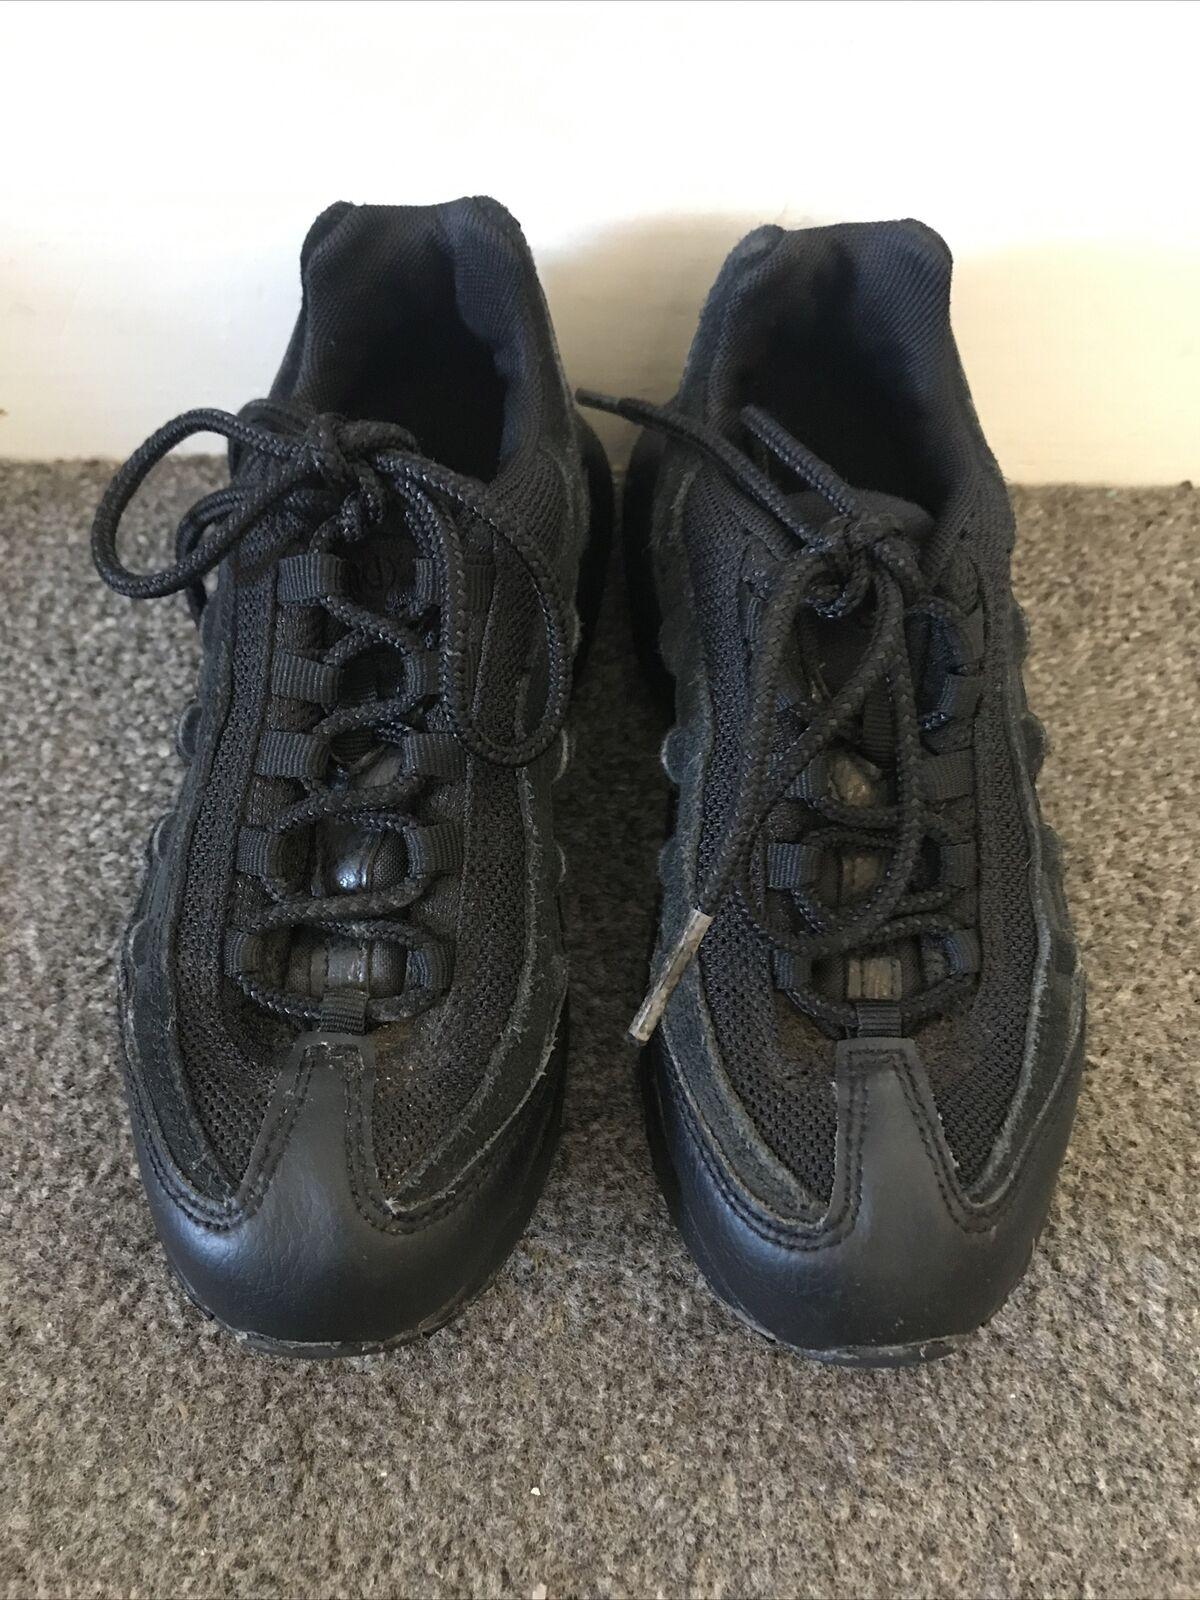 Nike Air Max 95 Kids Black Trainers UK